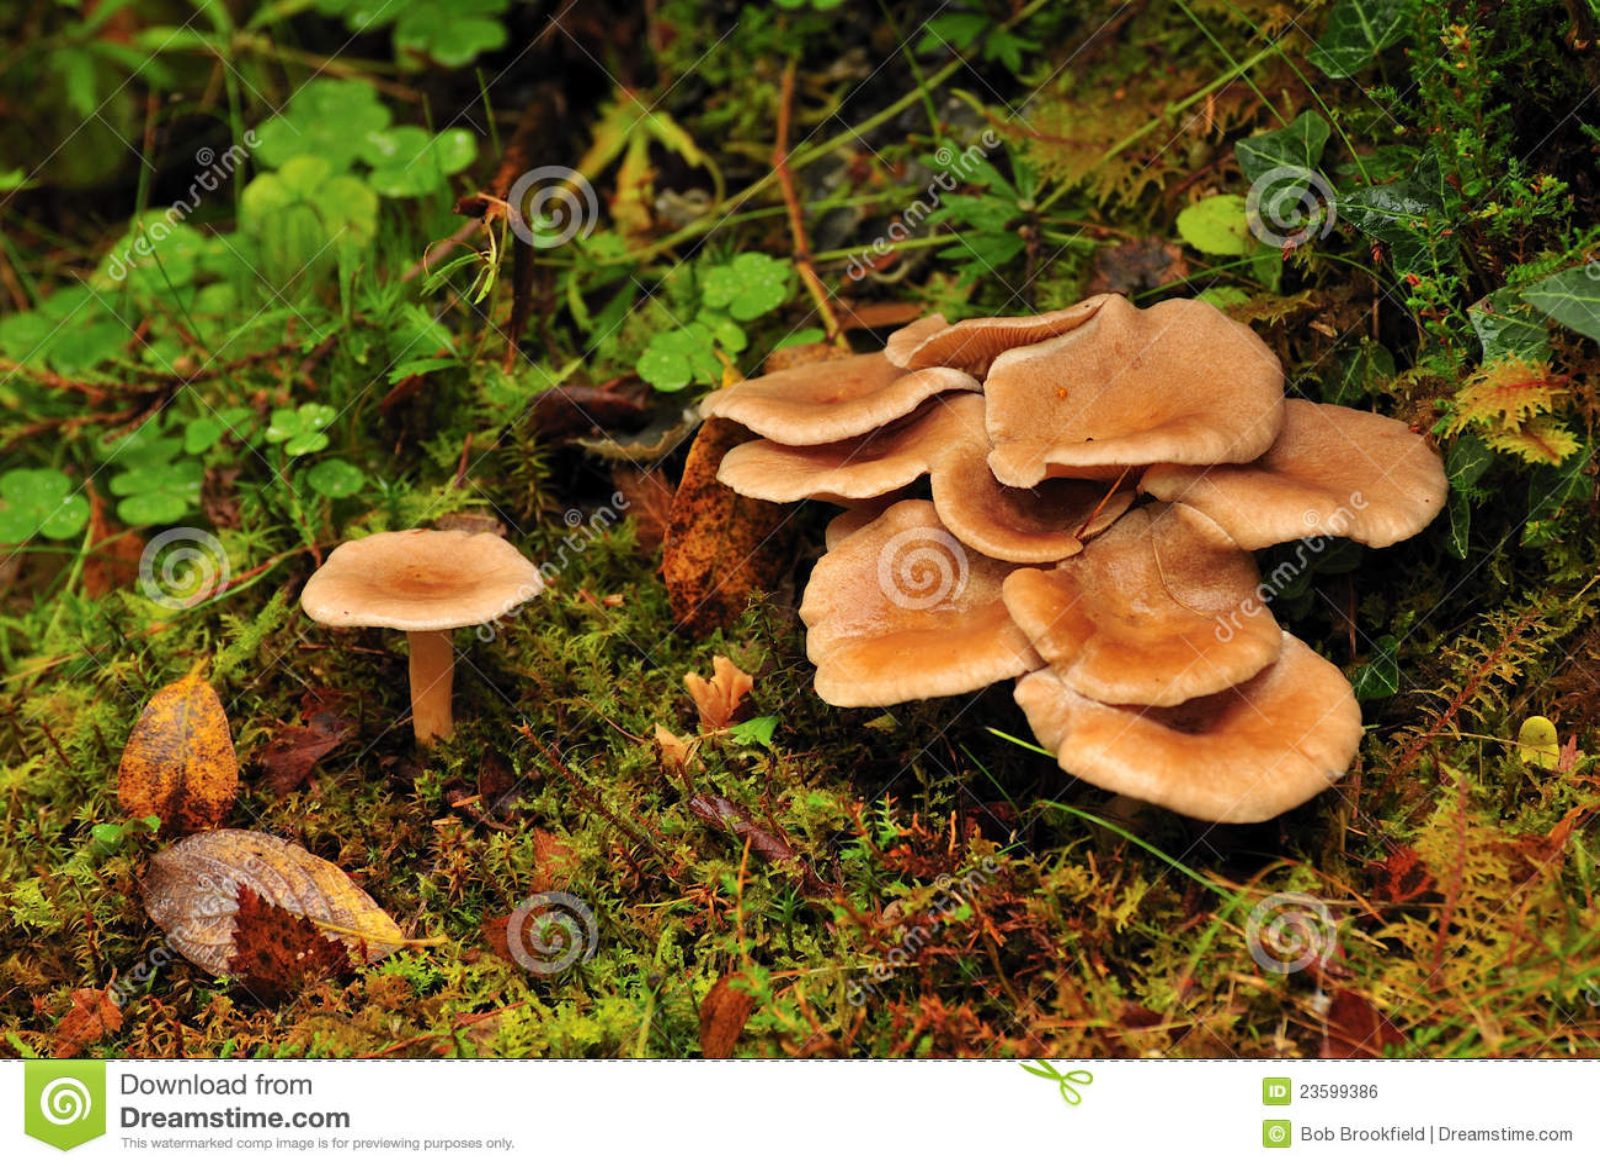 Wild mushrooms clitocybe squamulosa royalty free stock image image 23599386 - Wild mushrooms business ideas ...